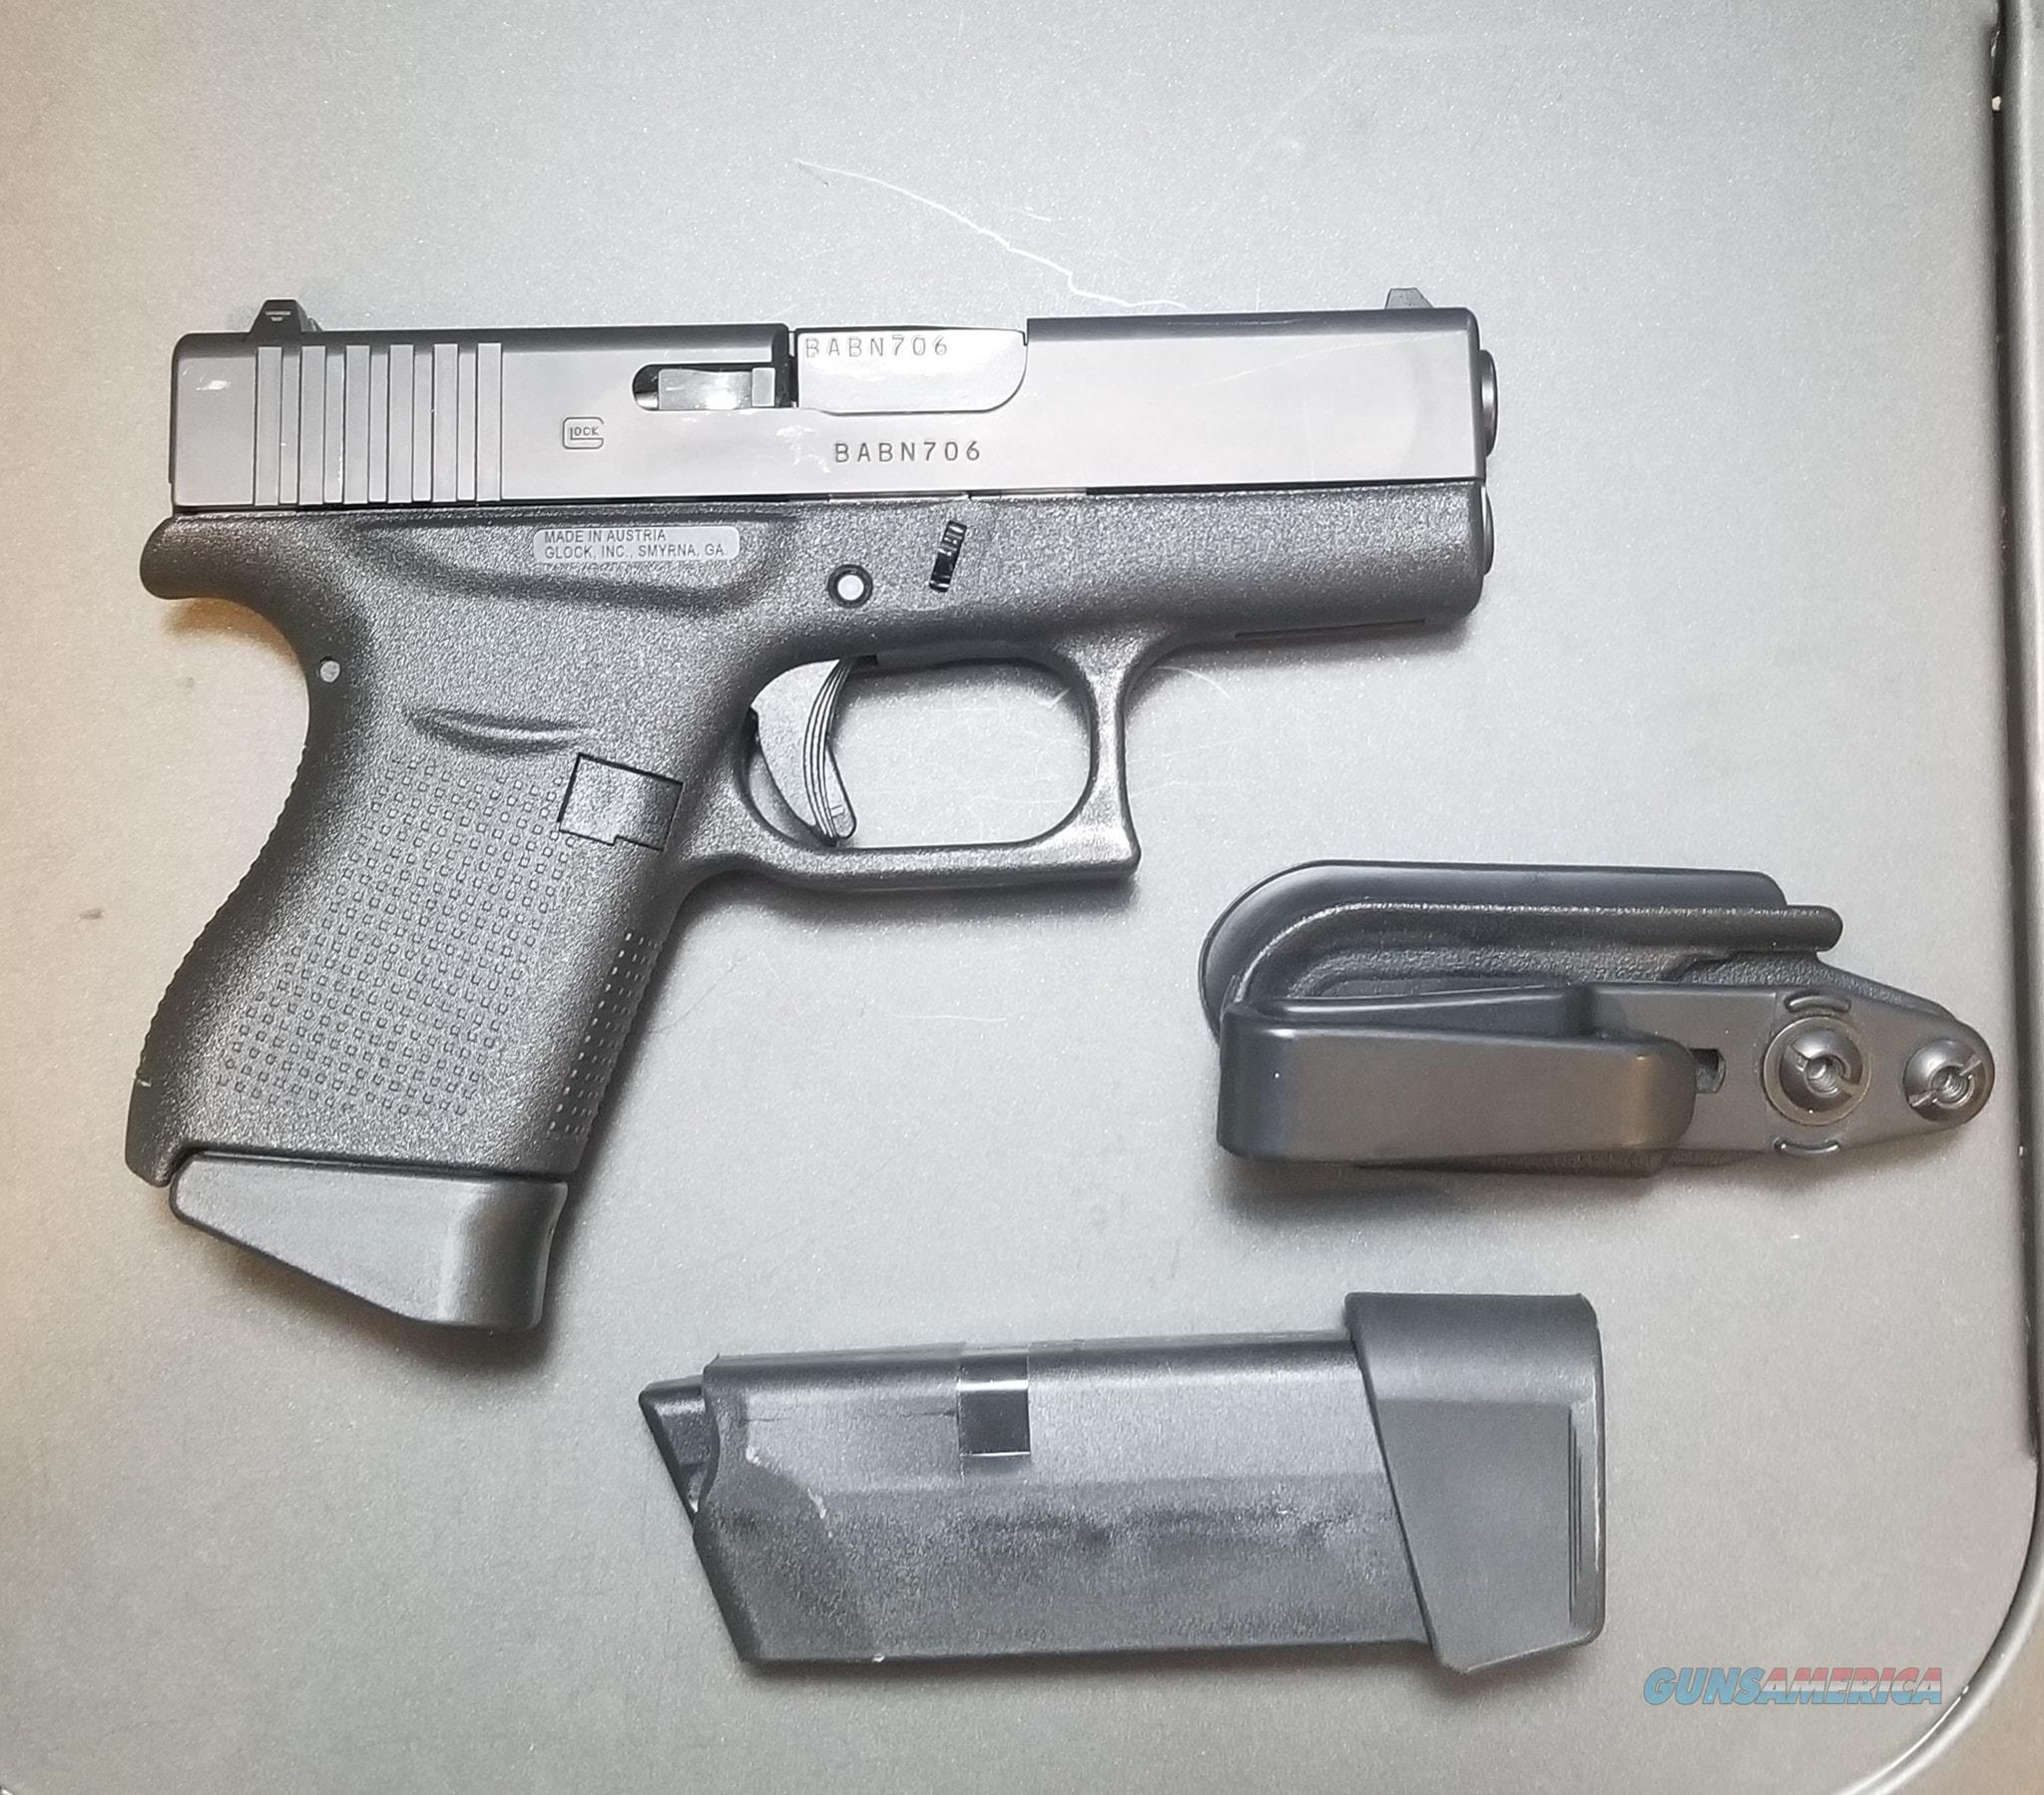 Glock 43  Guns > Pistols > Glock Pistols > 43/43X